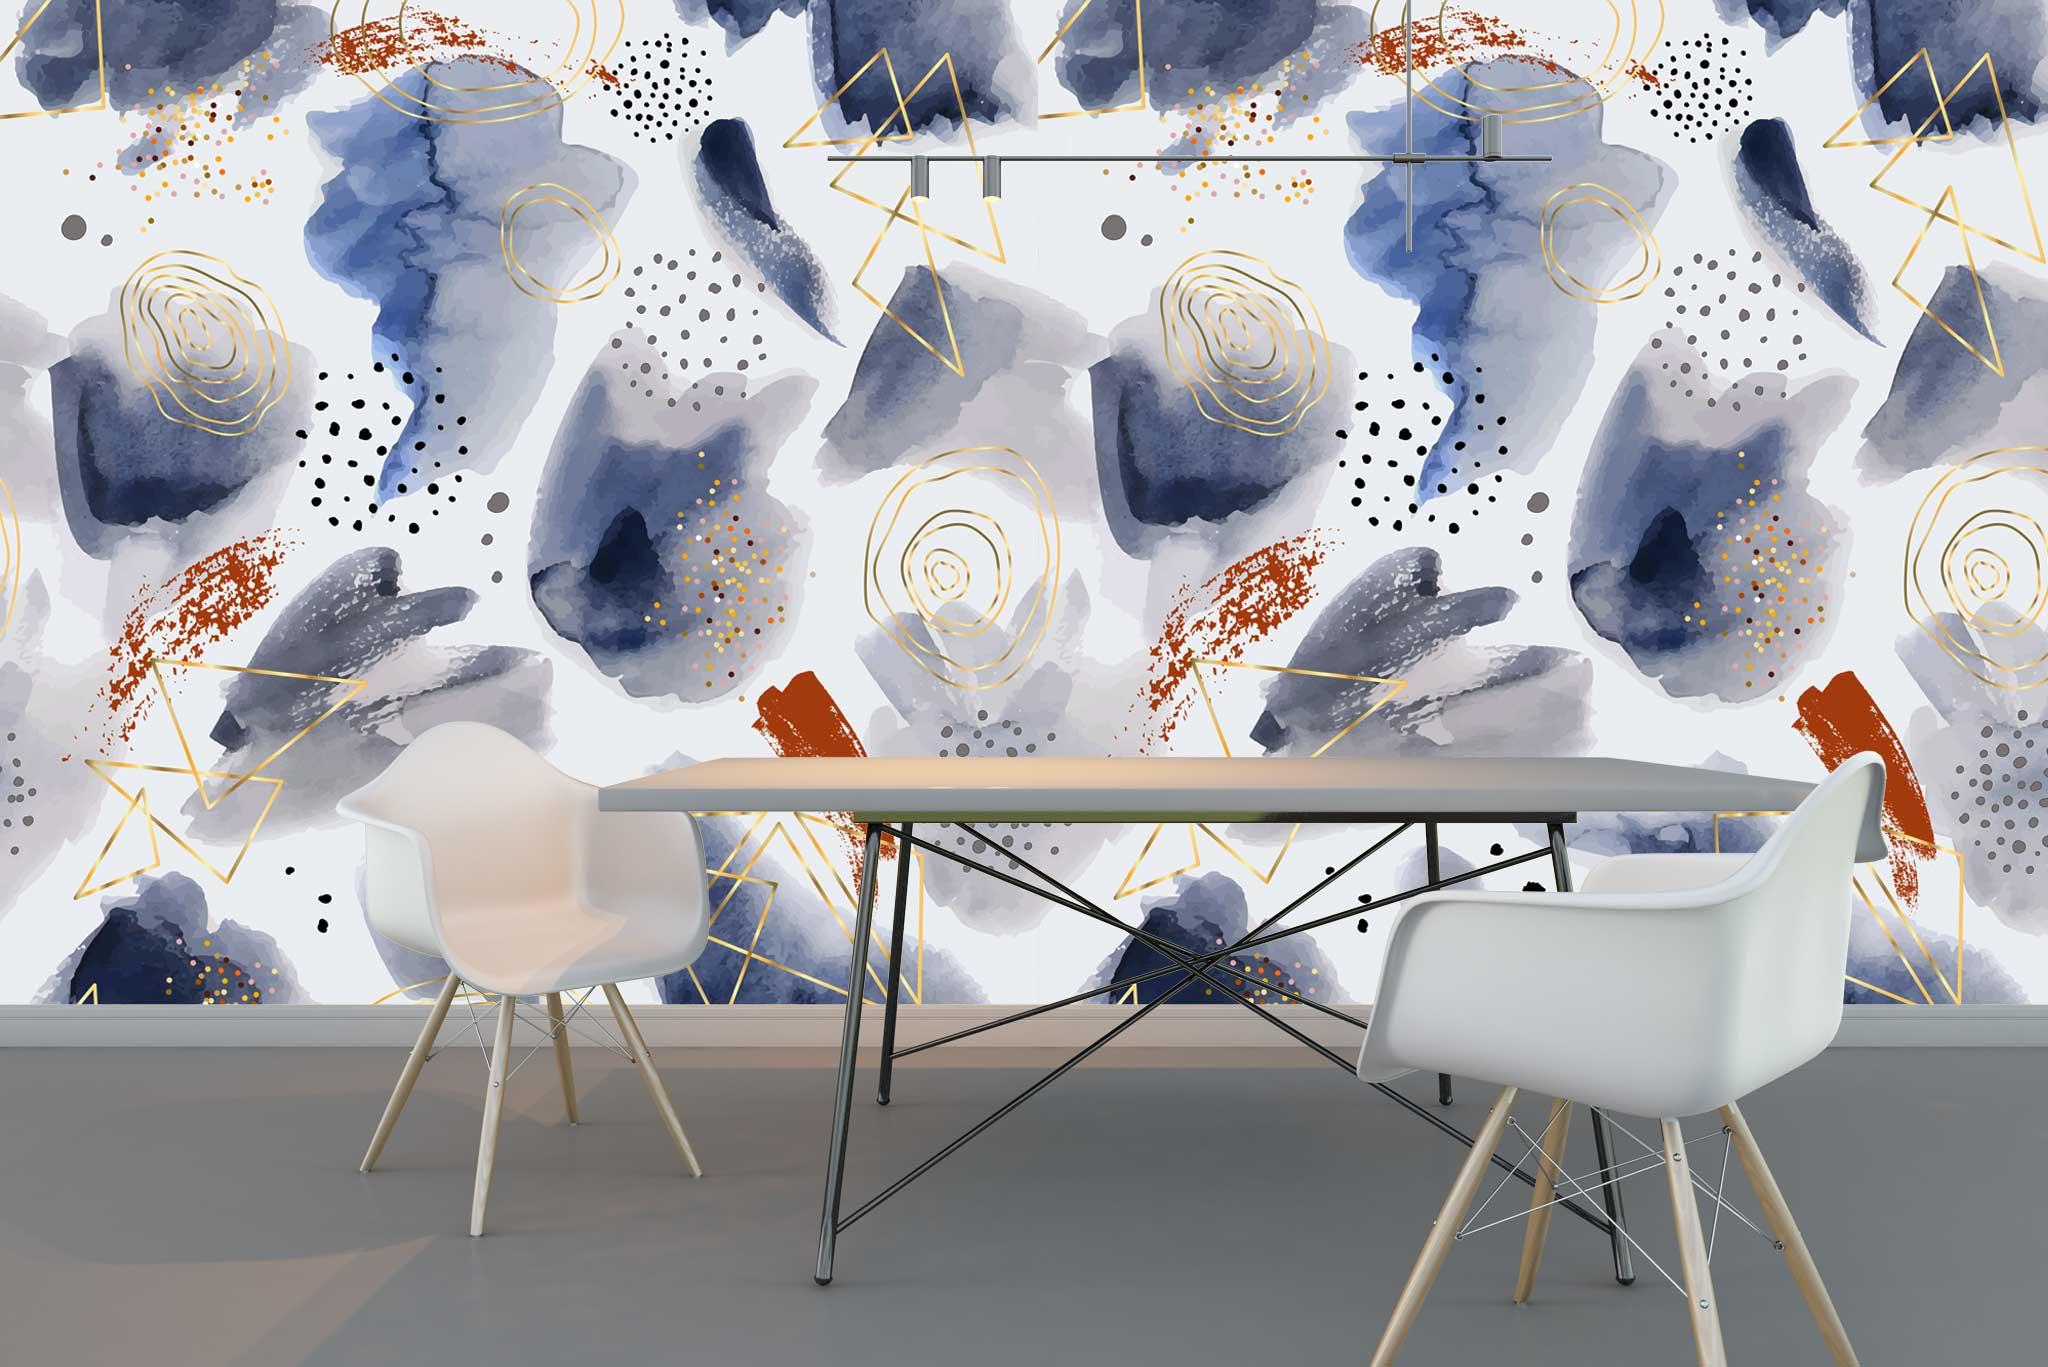 tapet-fototapet-comanda-personalizat-bucuresti-perete-special-lux-model-pictura-desen-abstract-grafic-acuarela-albastru-auriu